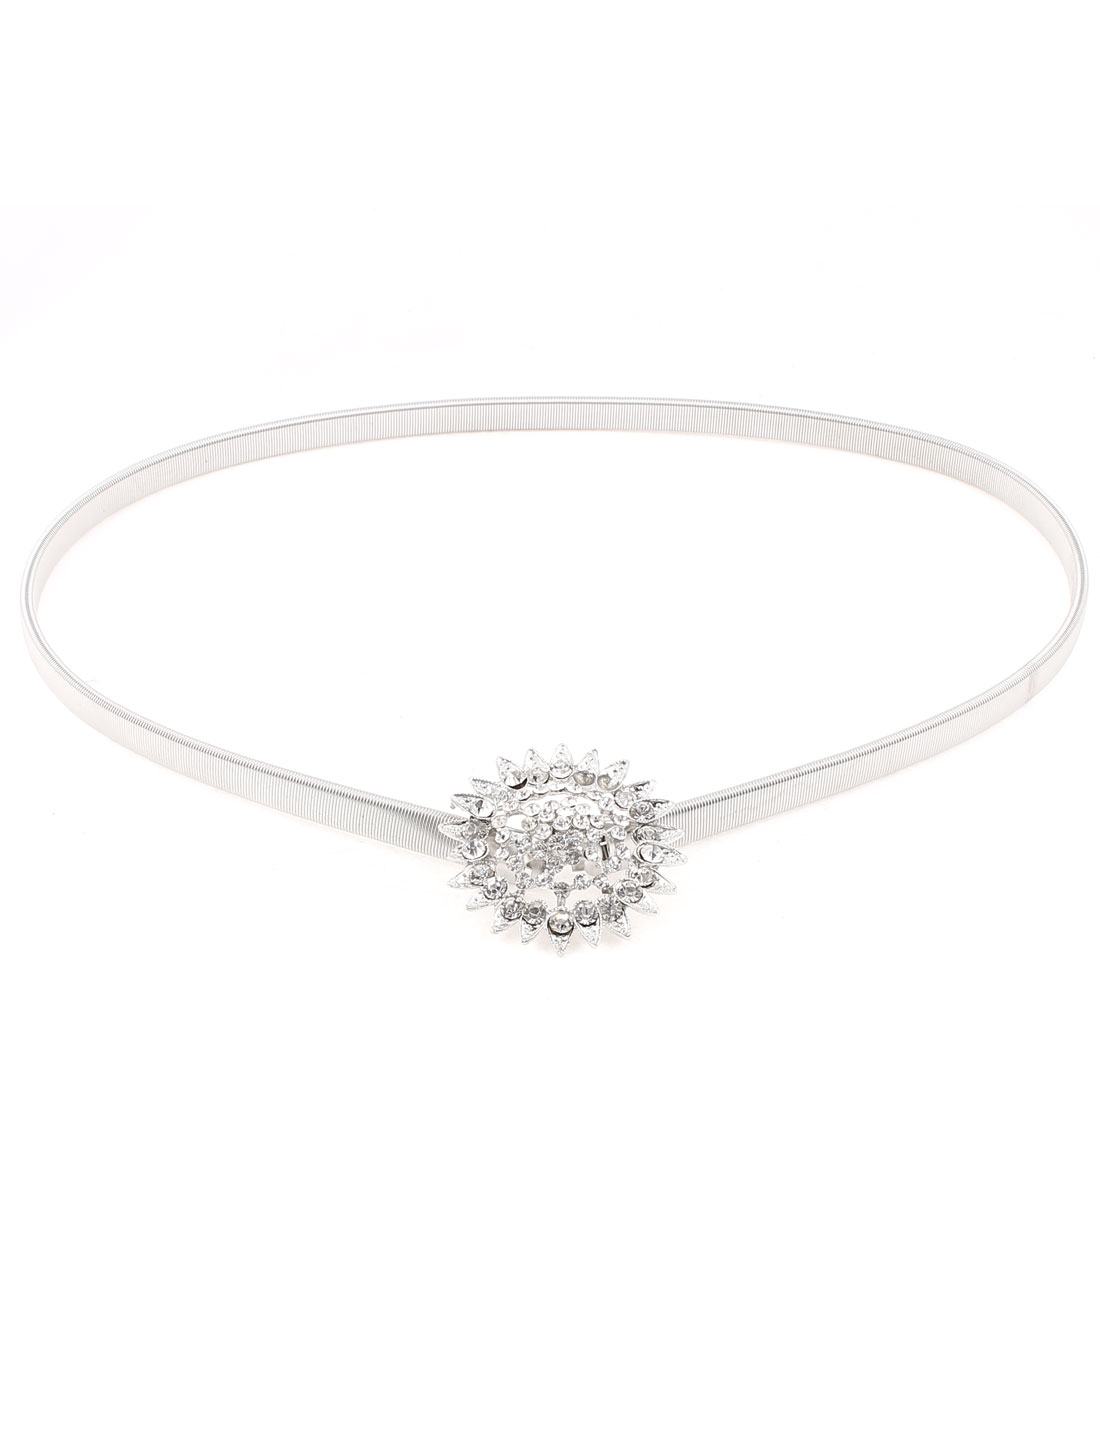 Lady Blouse Dress Match Rhinestone Inlaid Flower Shaped Interlocking Buckle Metal Elastic Waistbelt Waist Belt Chain Silver Tone